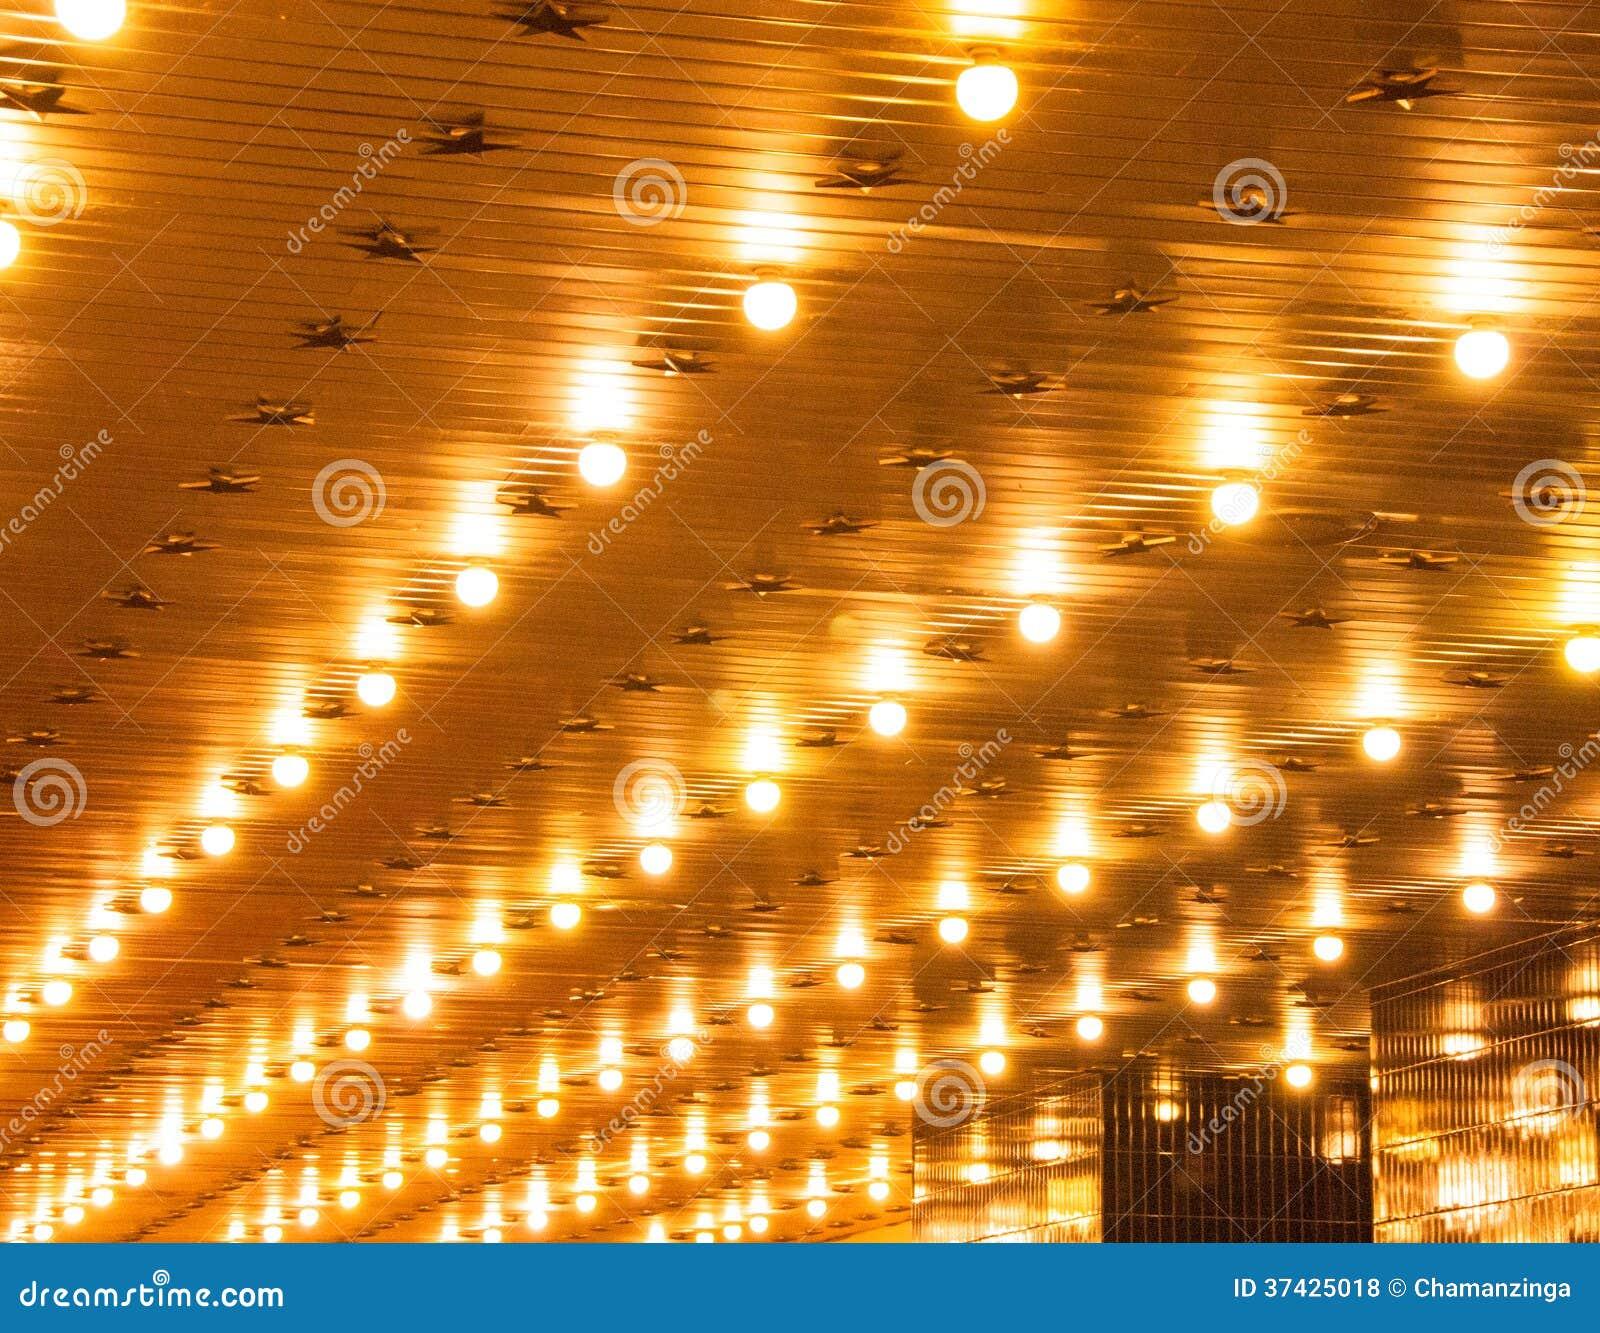 Theater Lights Background: Marquee Lights Stock Photo. Image Of Illumination, Black